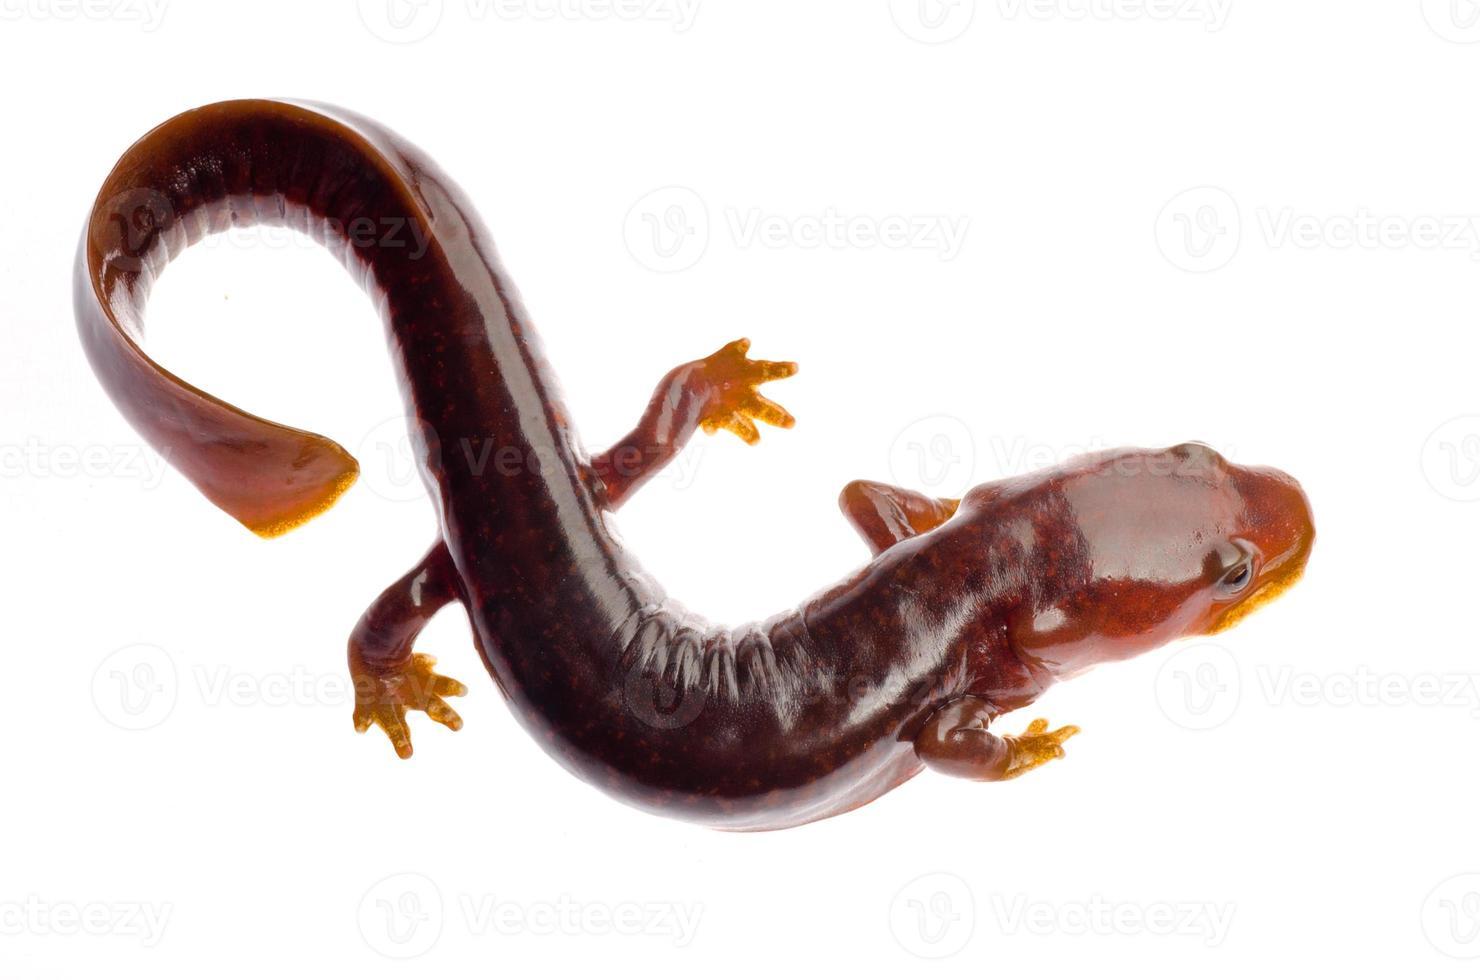 tritón salamandra tsitou chino foto